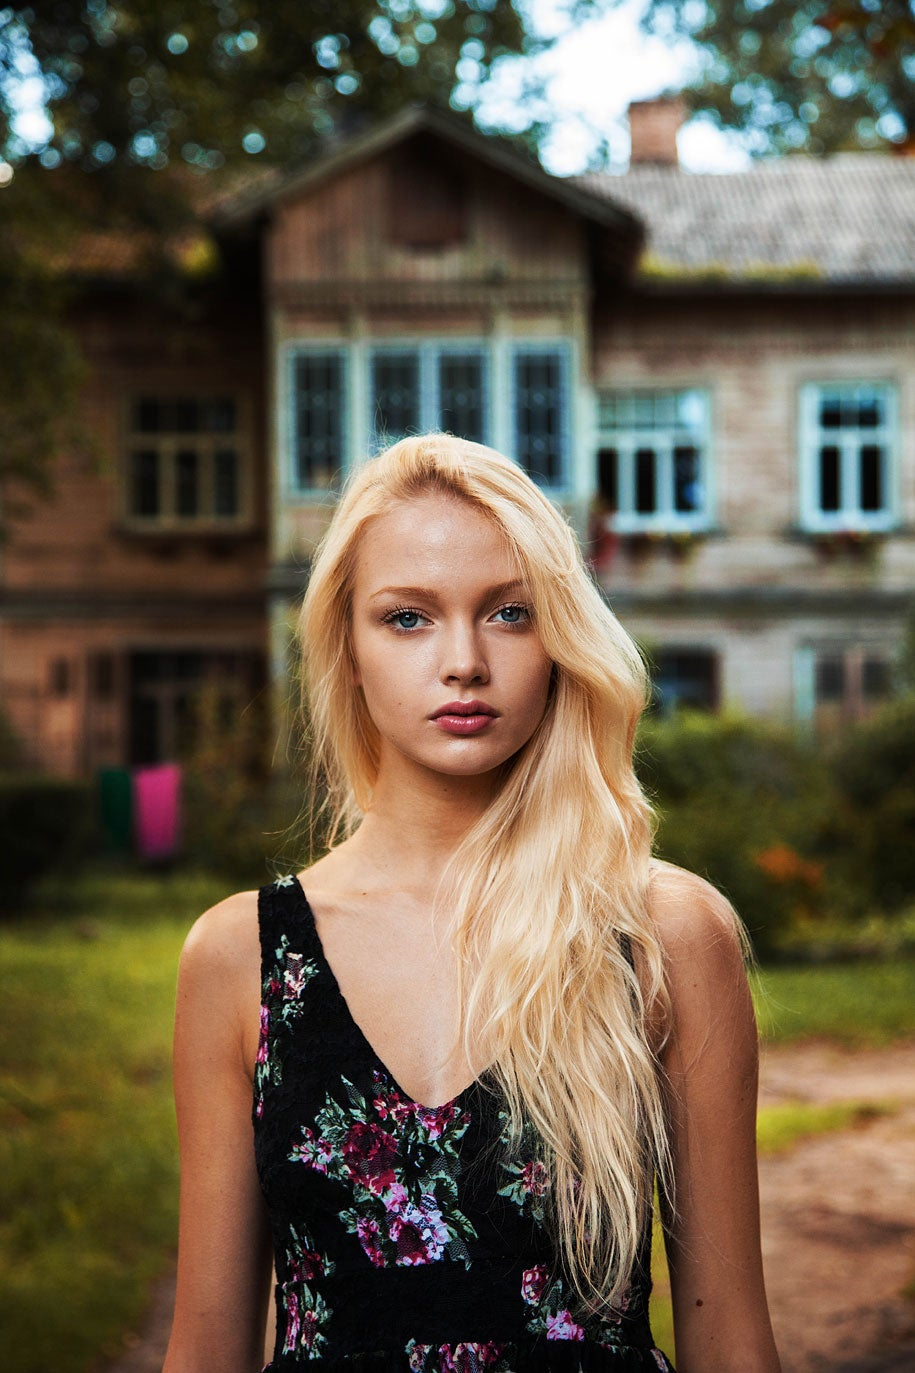 latvia-woman-mihaela-noroc-min